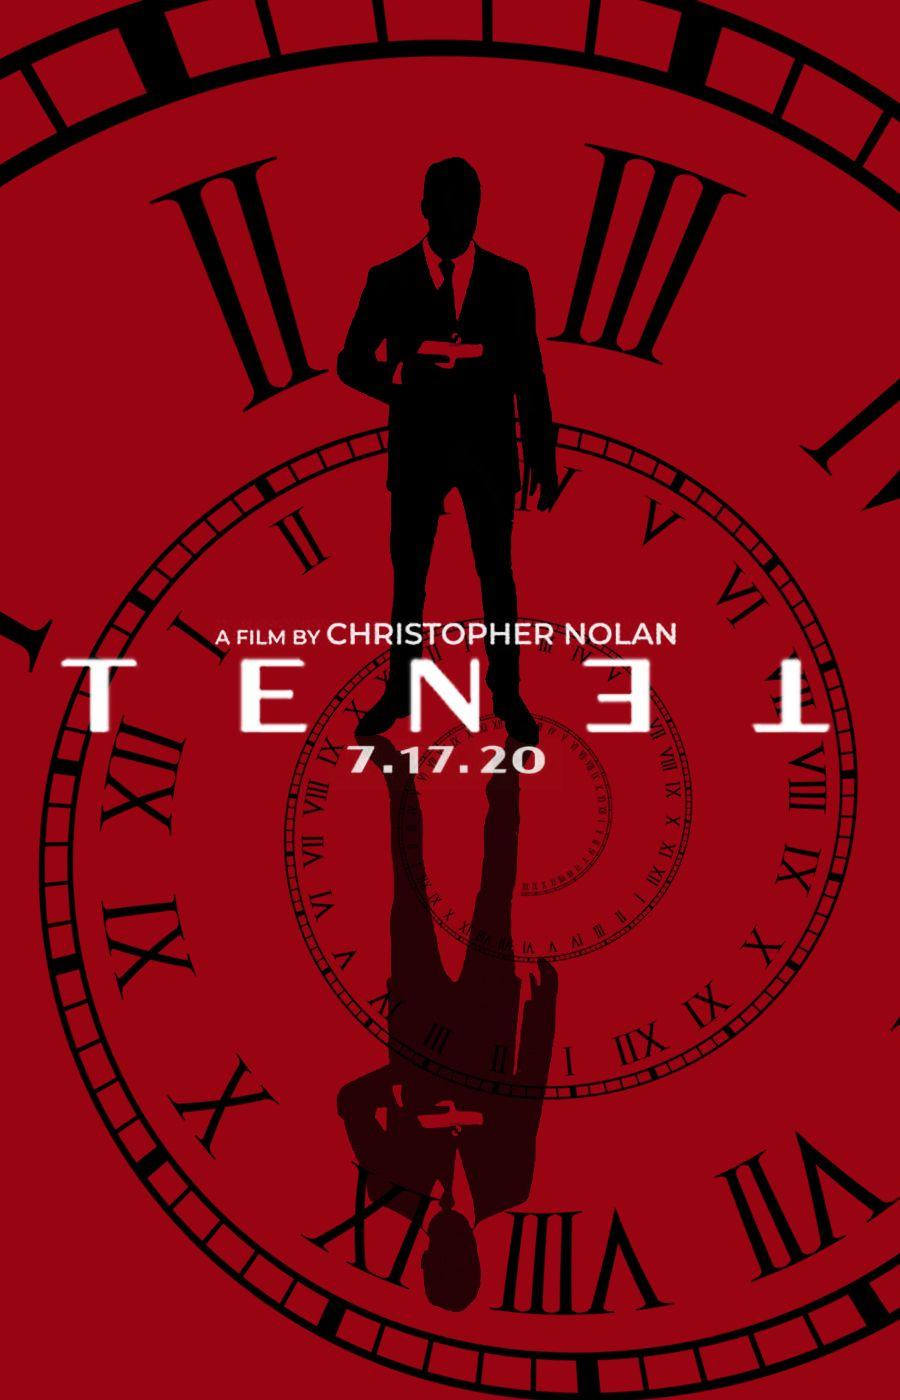 Tenet movie poster by DComp on DeviantArt